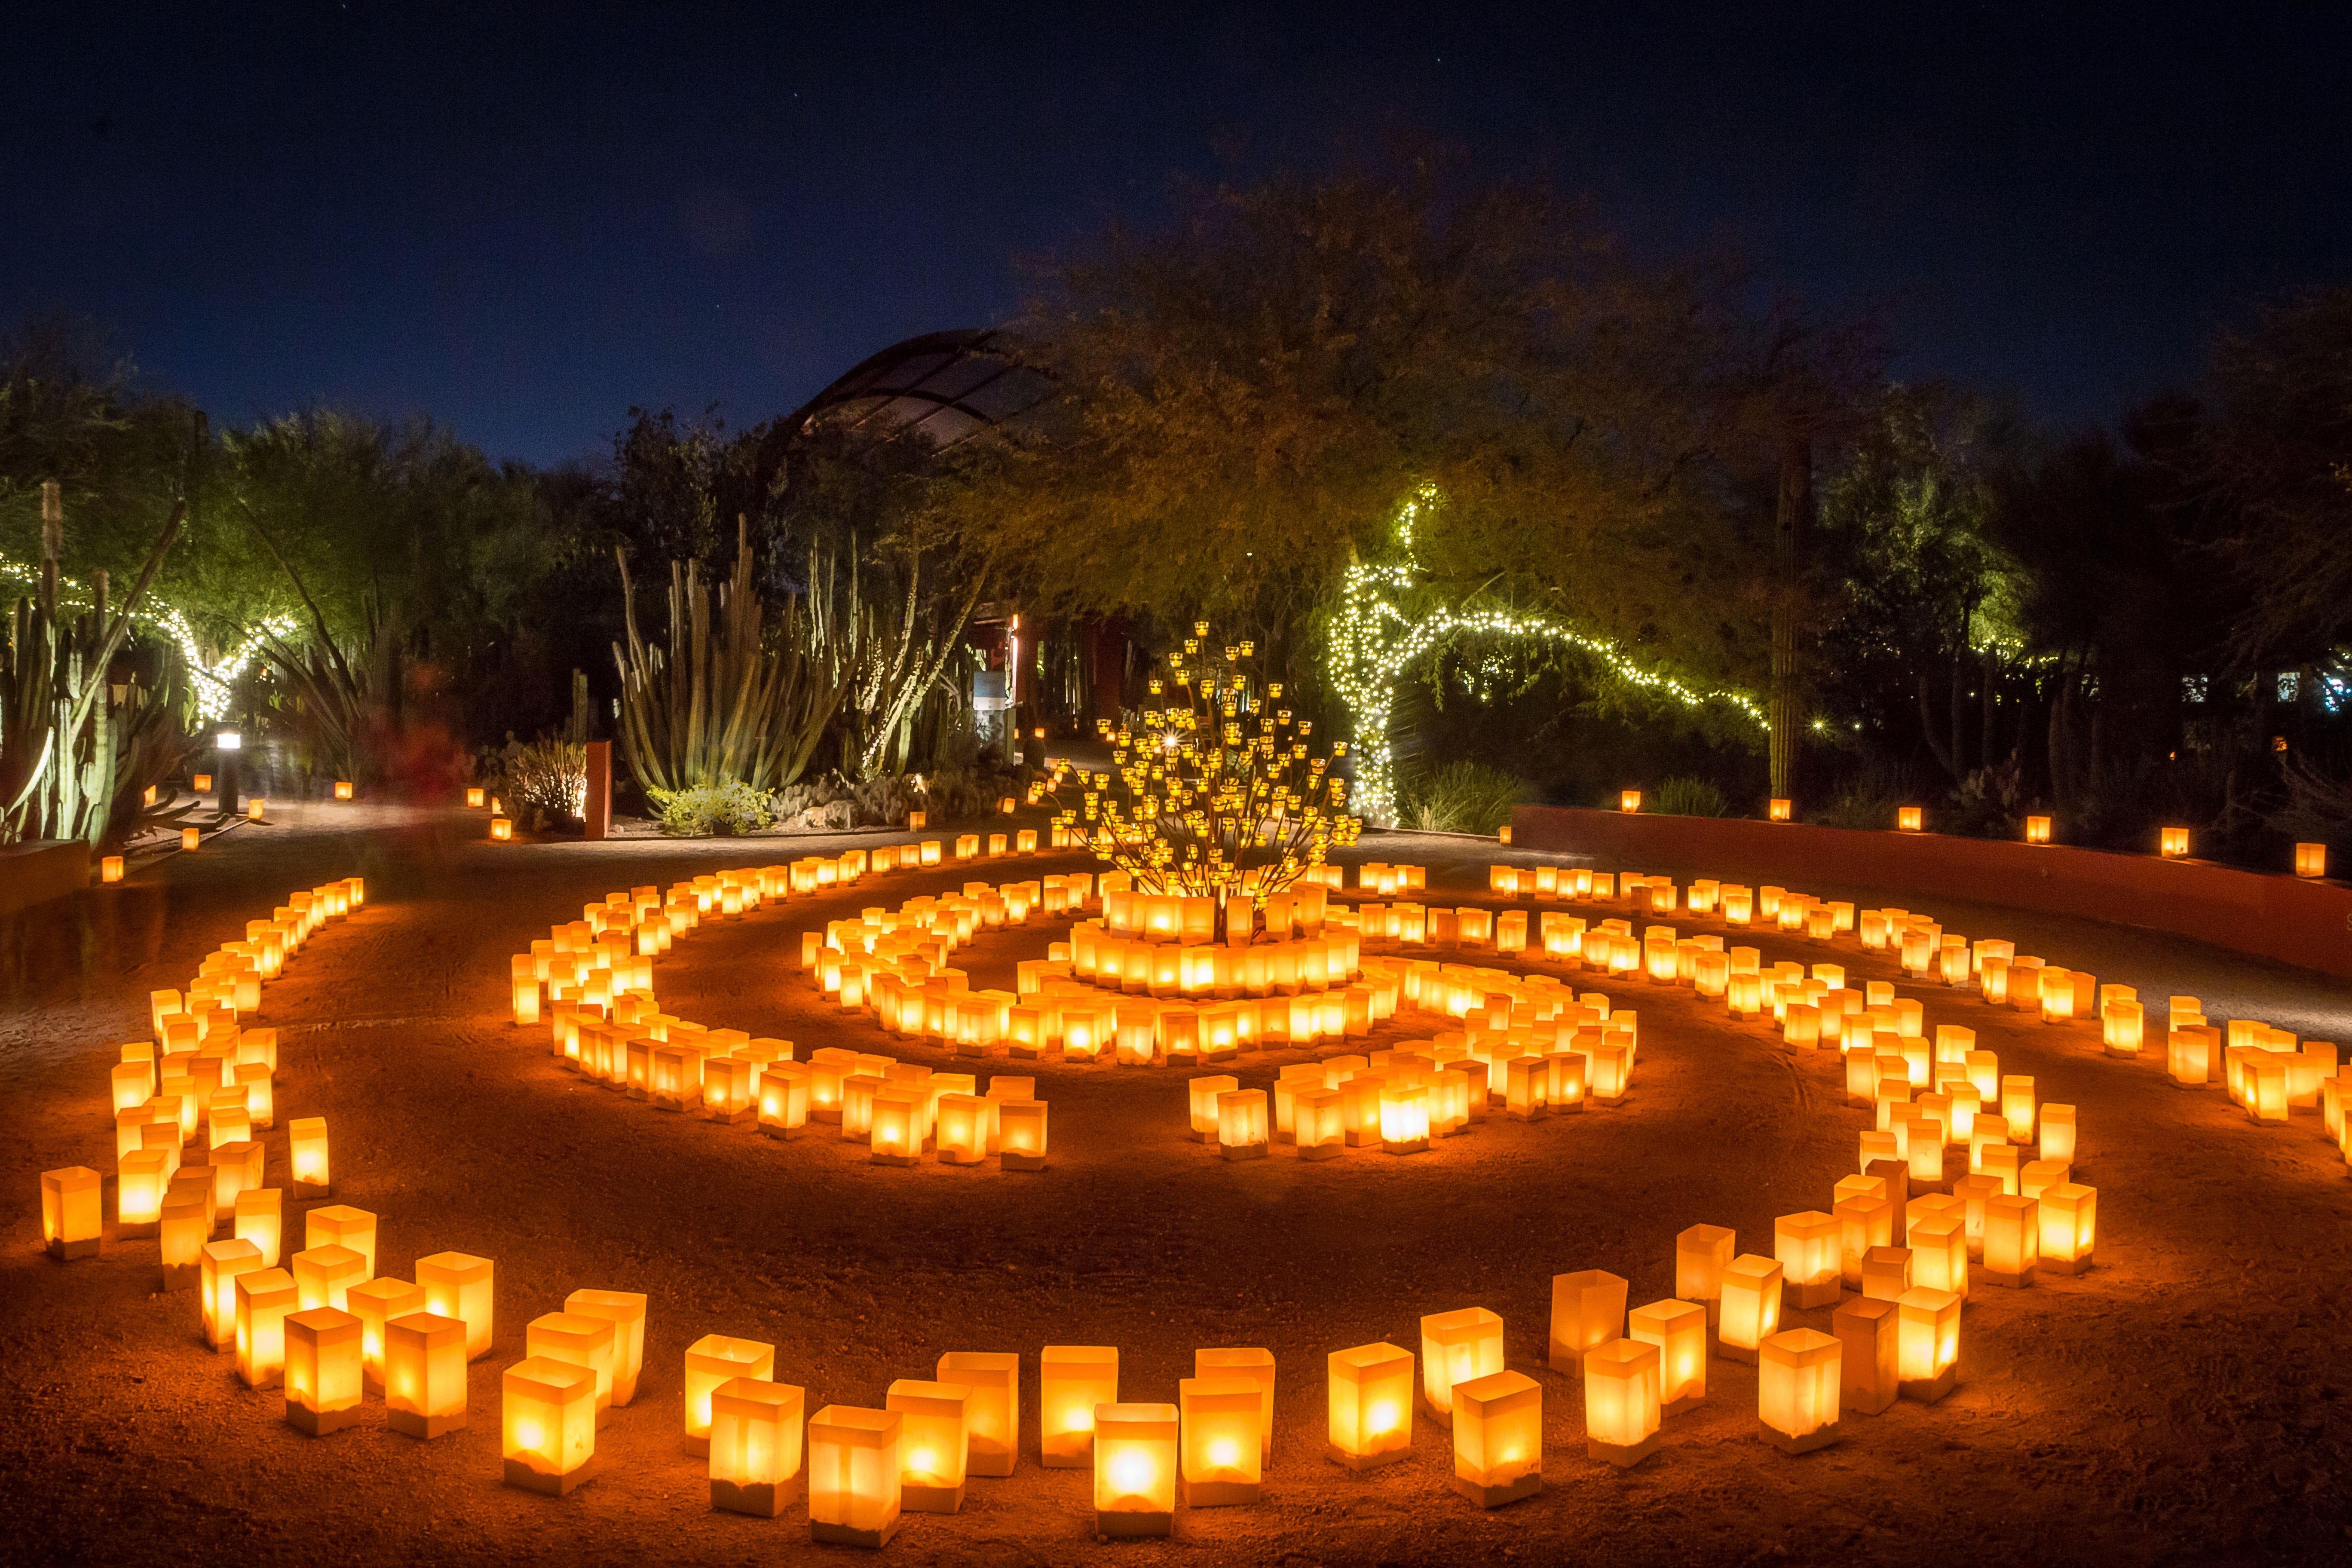 Las Noches De Las Luminarias Returns To Desert Botanical Garden On Nov. 25.  (Photo: ADAMSPHOTO)